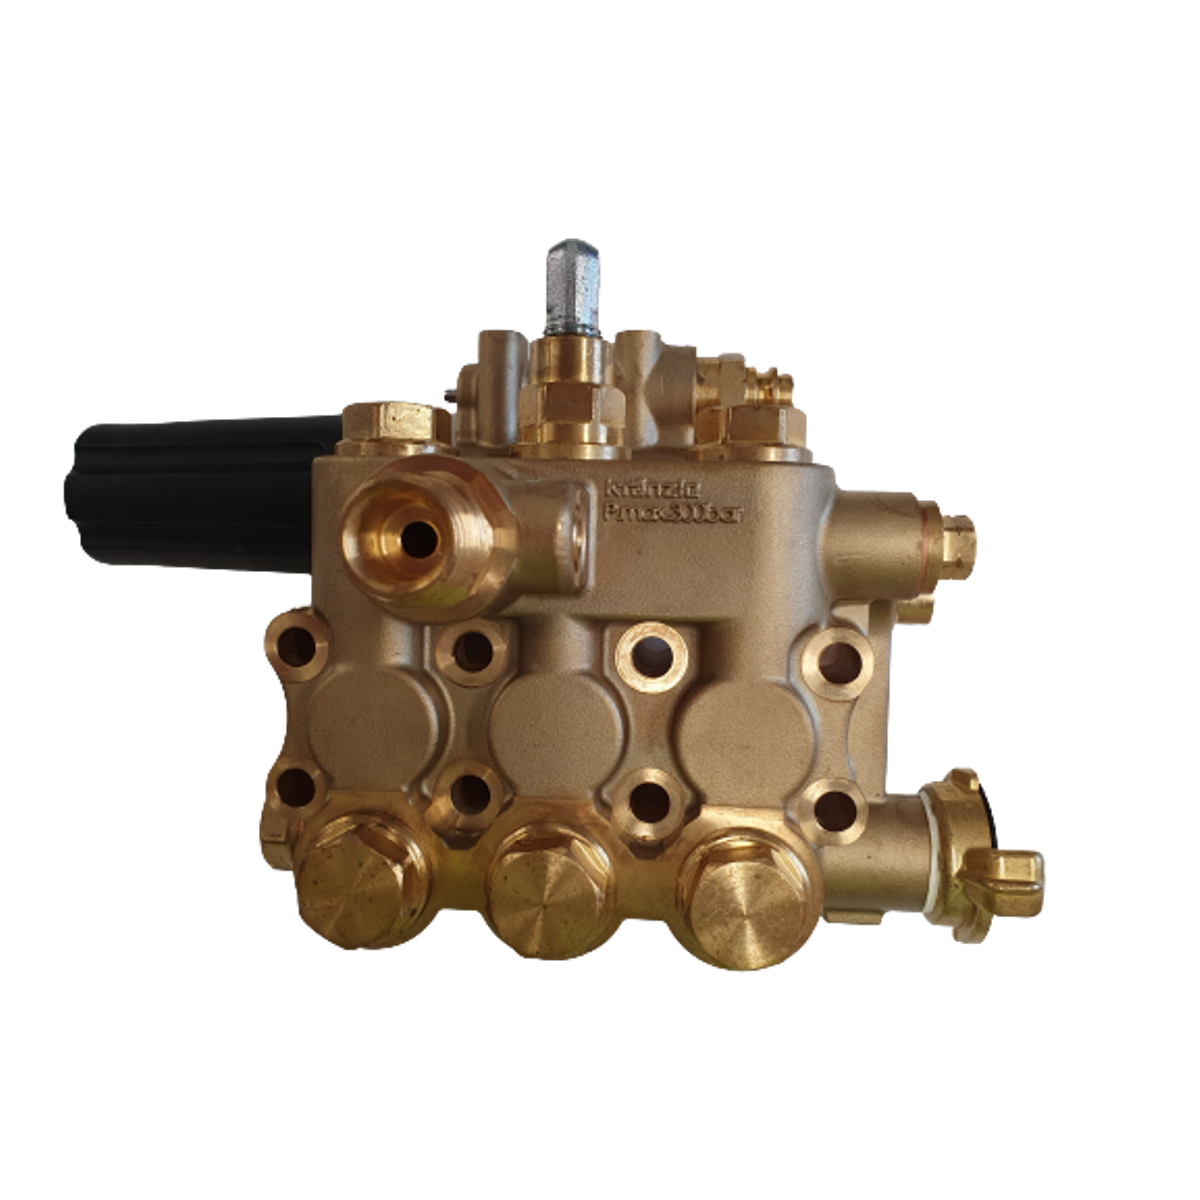 486050  Kranzle ThermRP pump Head Complete